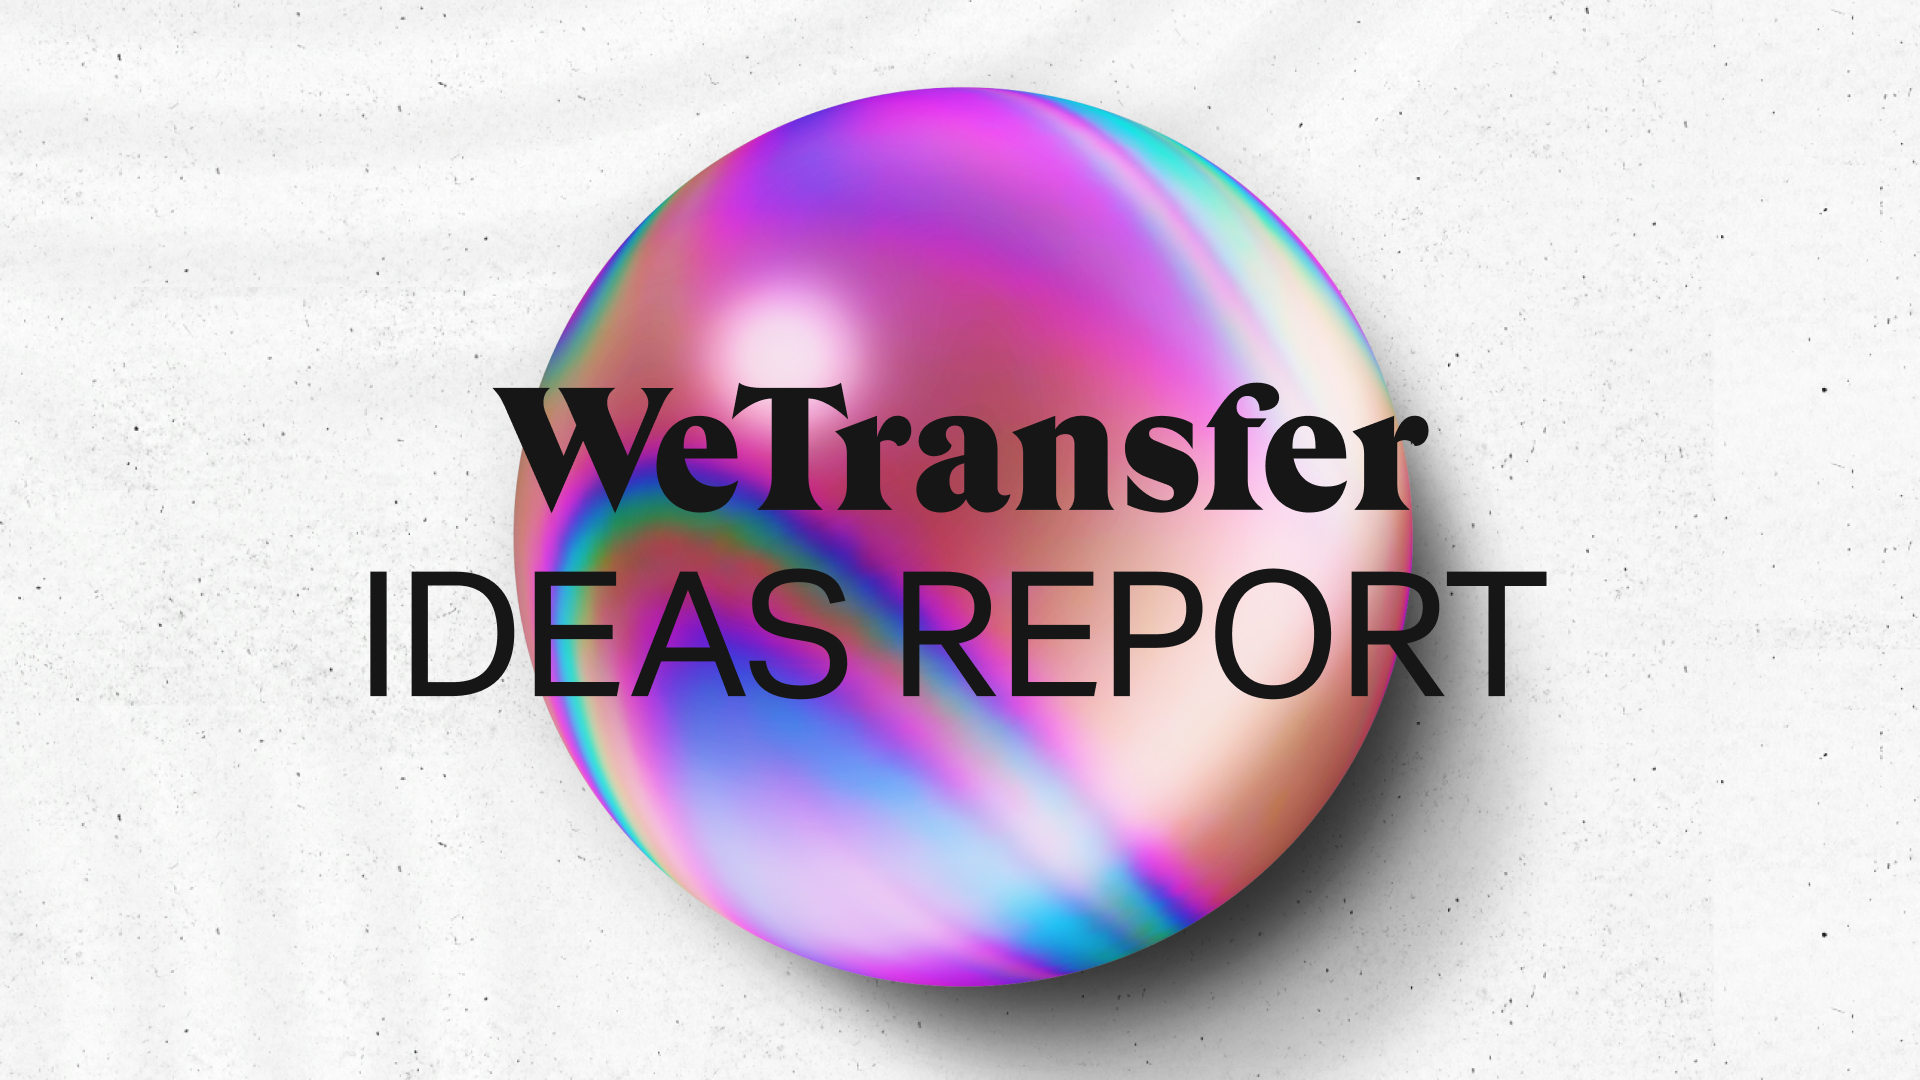 WT_IR20_Press_GroupC_LogoOnly_1.jpg